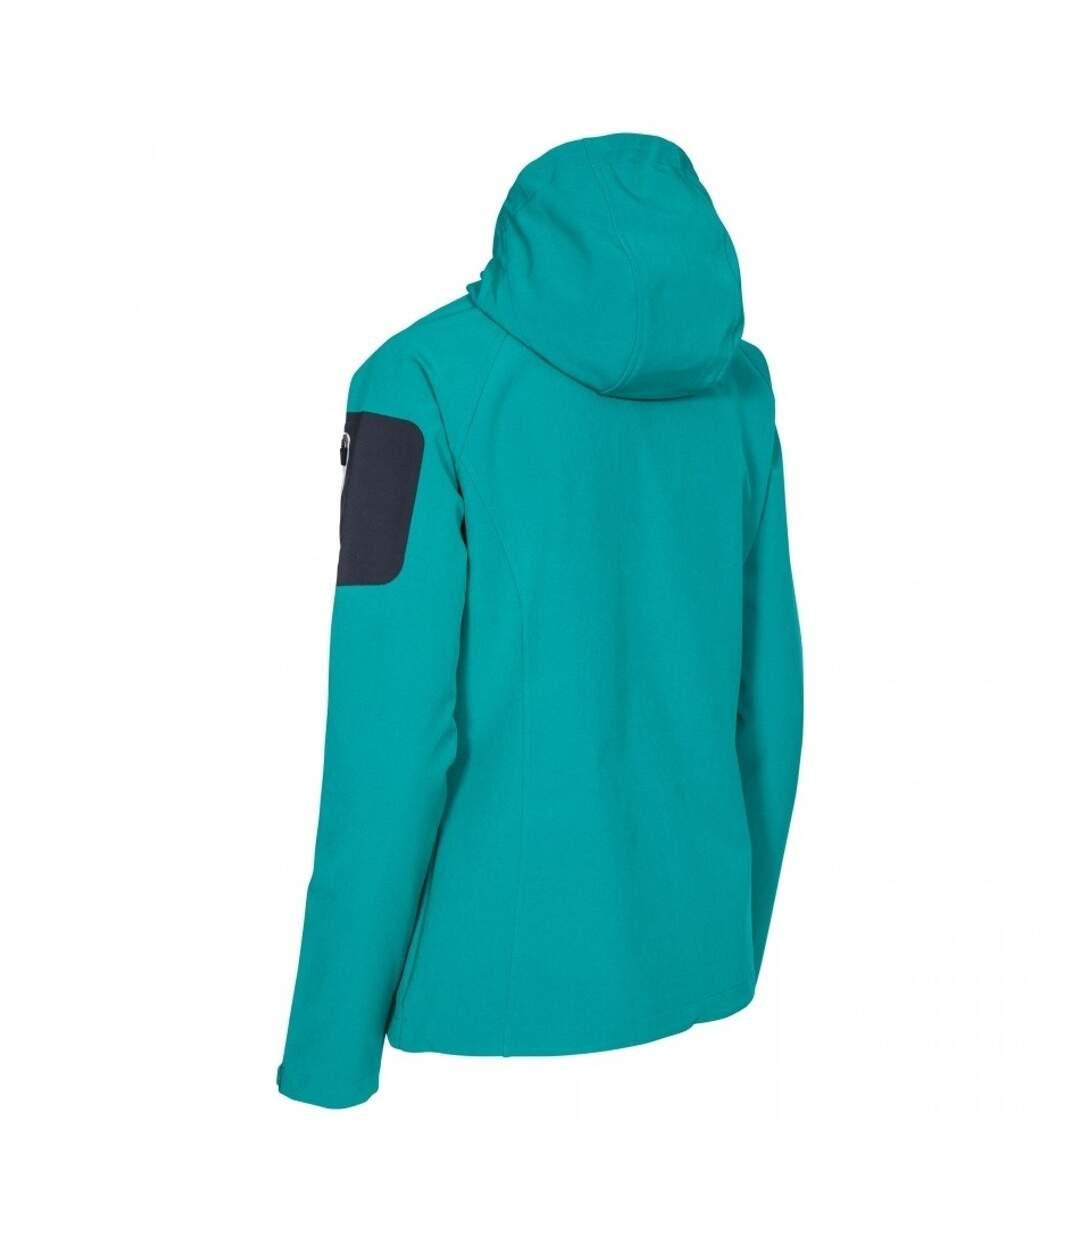 Trespass Womens/Ladies Landry Waterproof Softshell Jacket (Navy) - UTTP4614